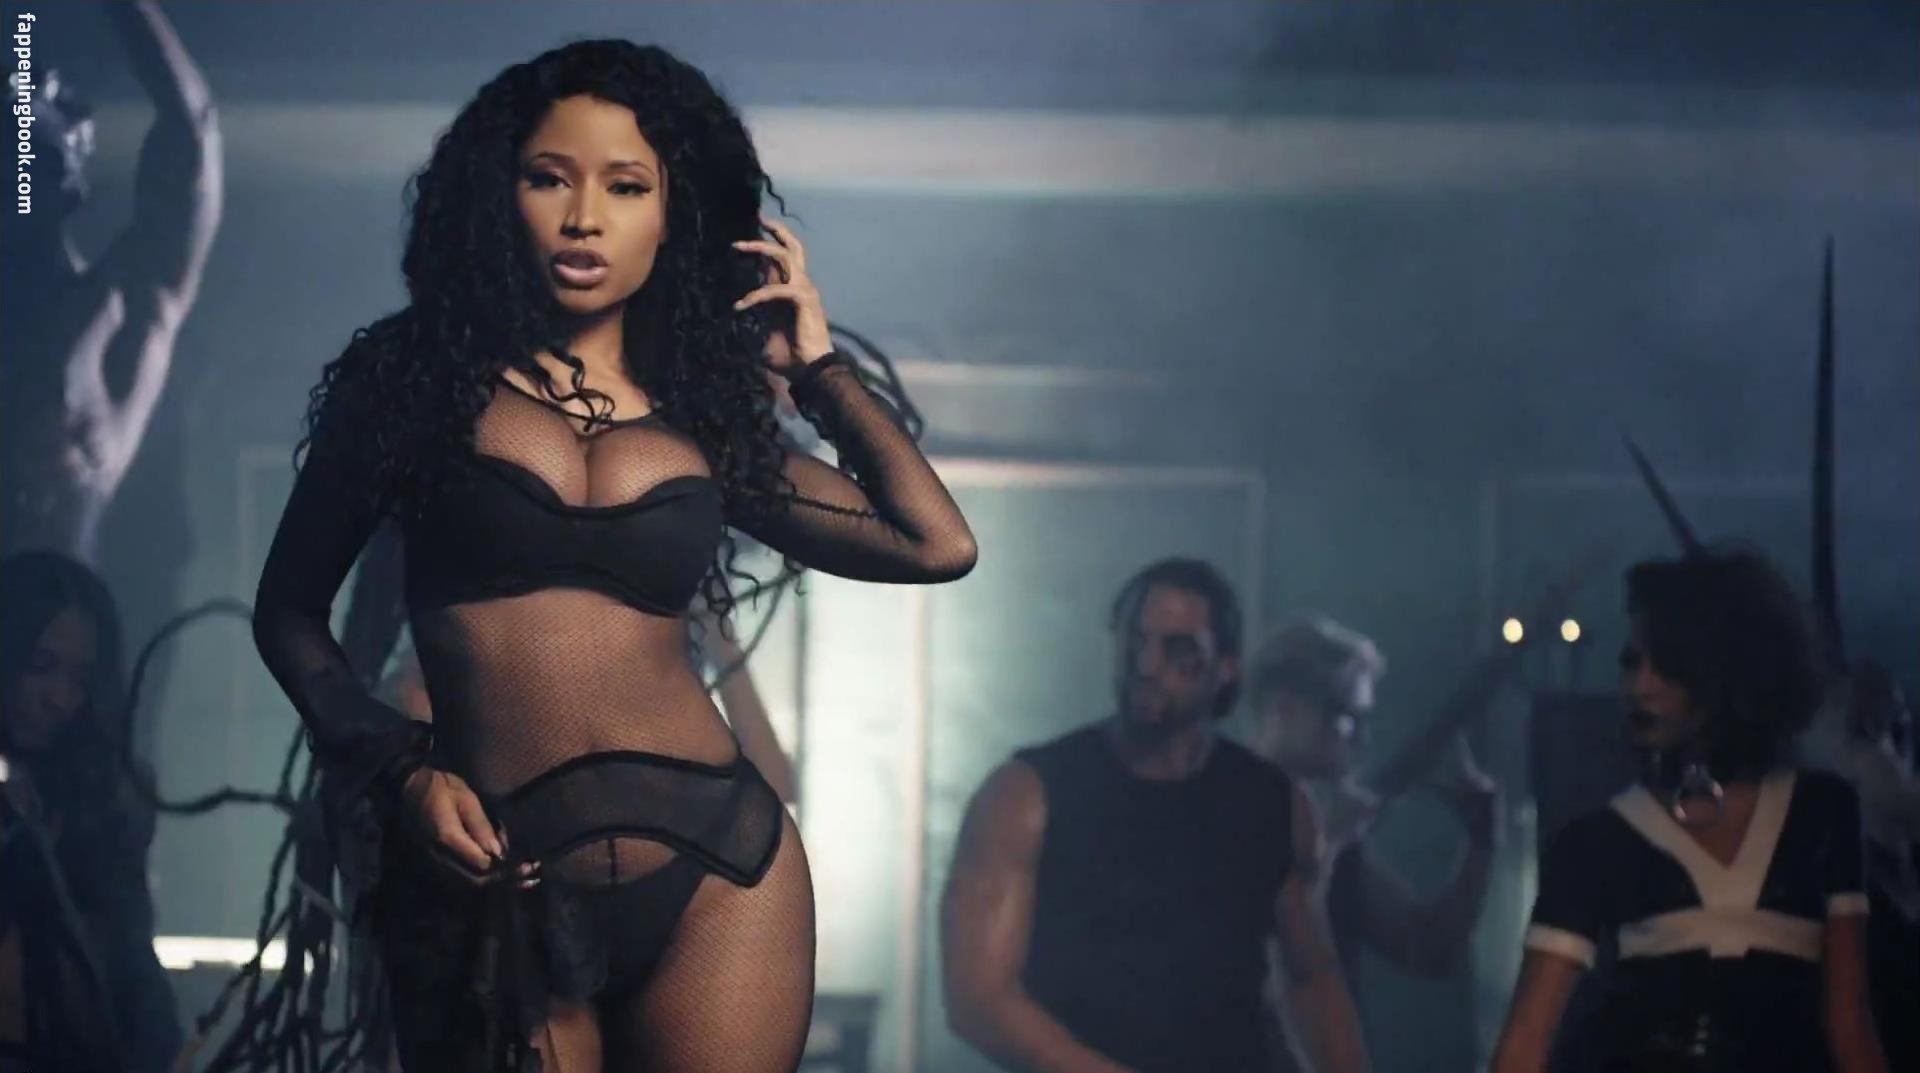 Superstar Www Nicki Minaj Nude Com Jpg